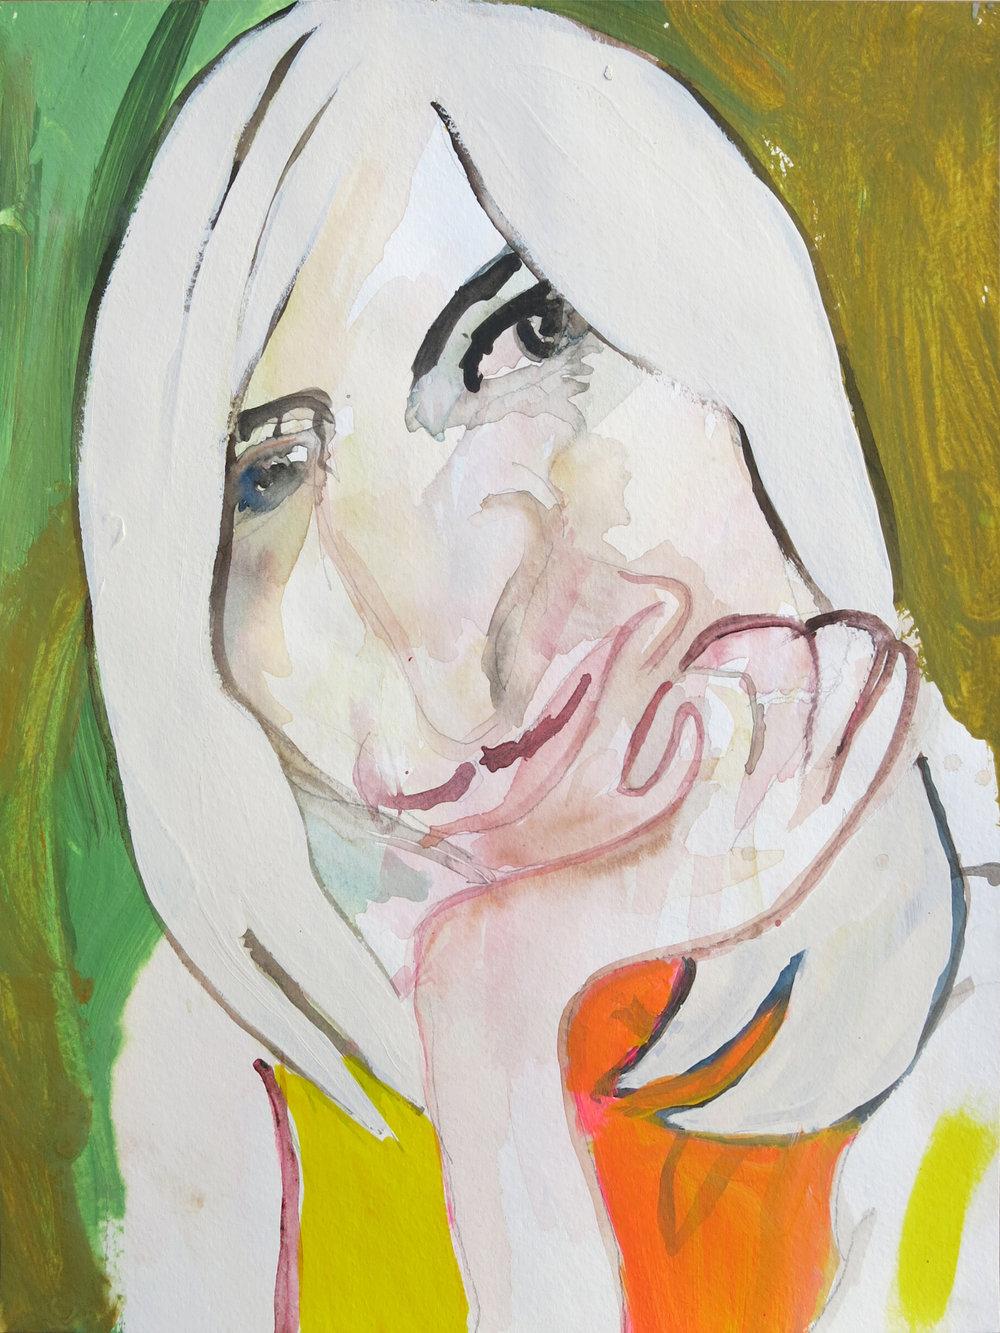 Barbra Streisand Portrait #59